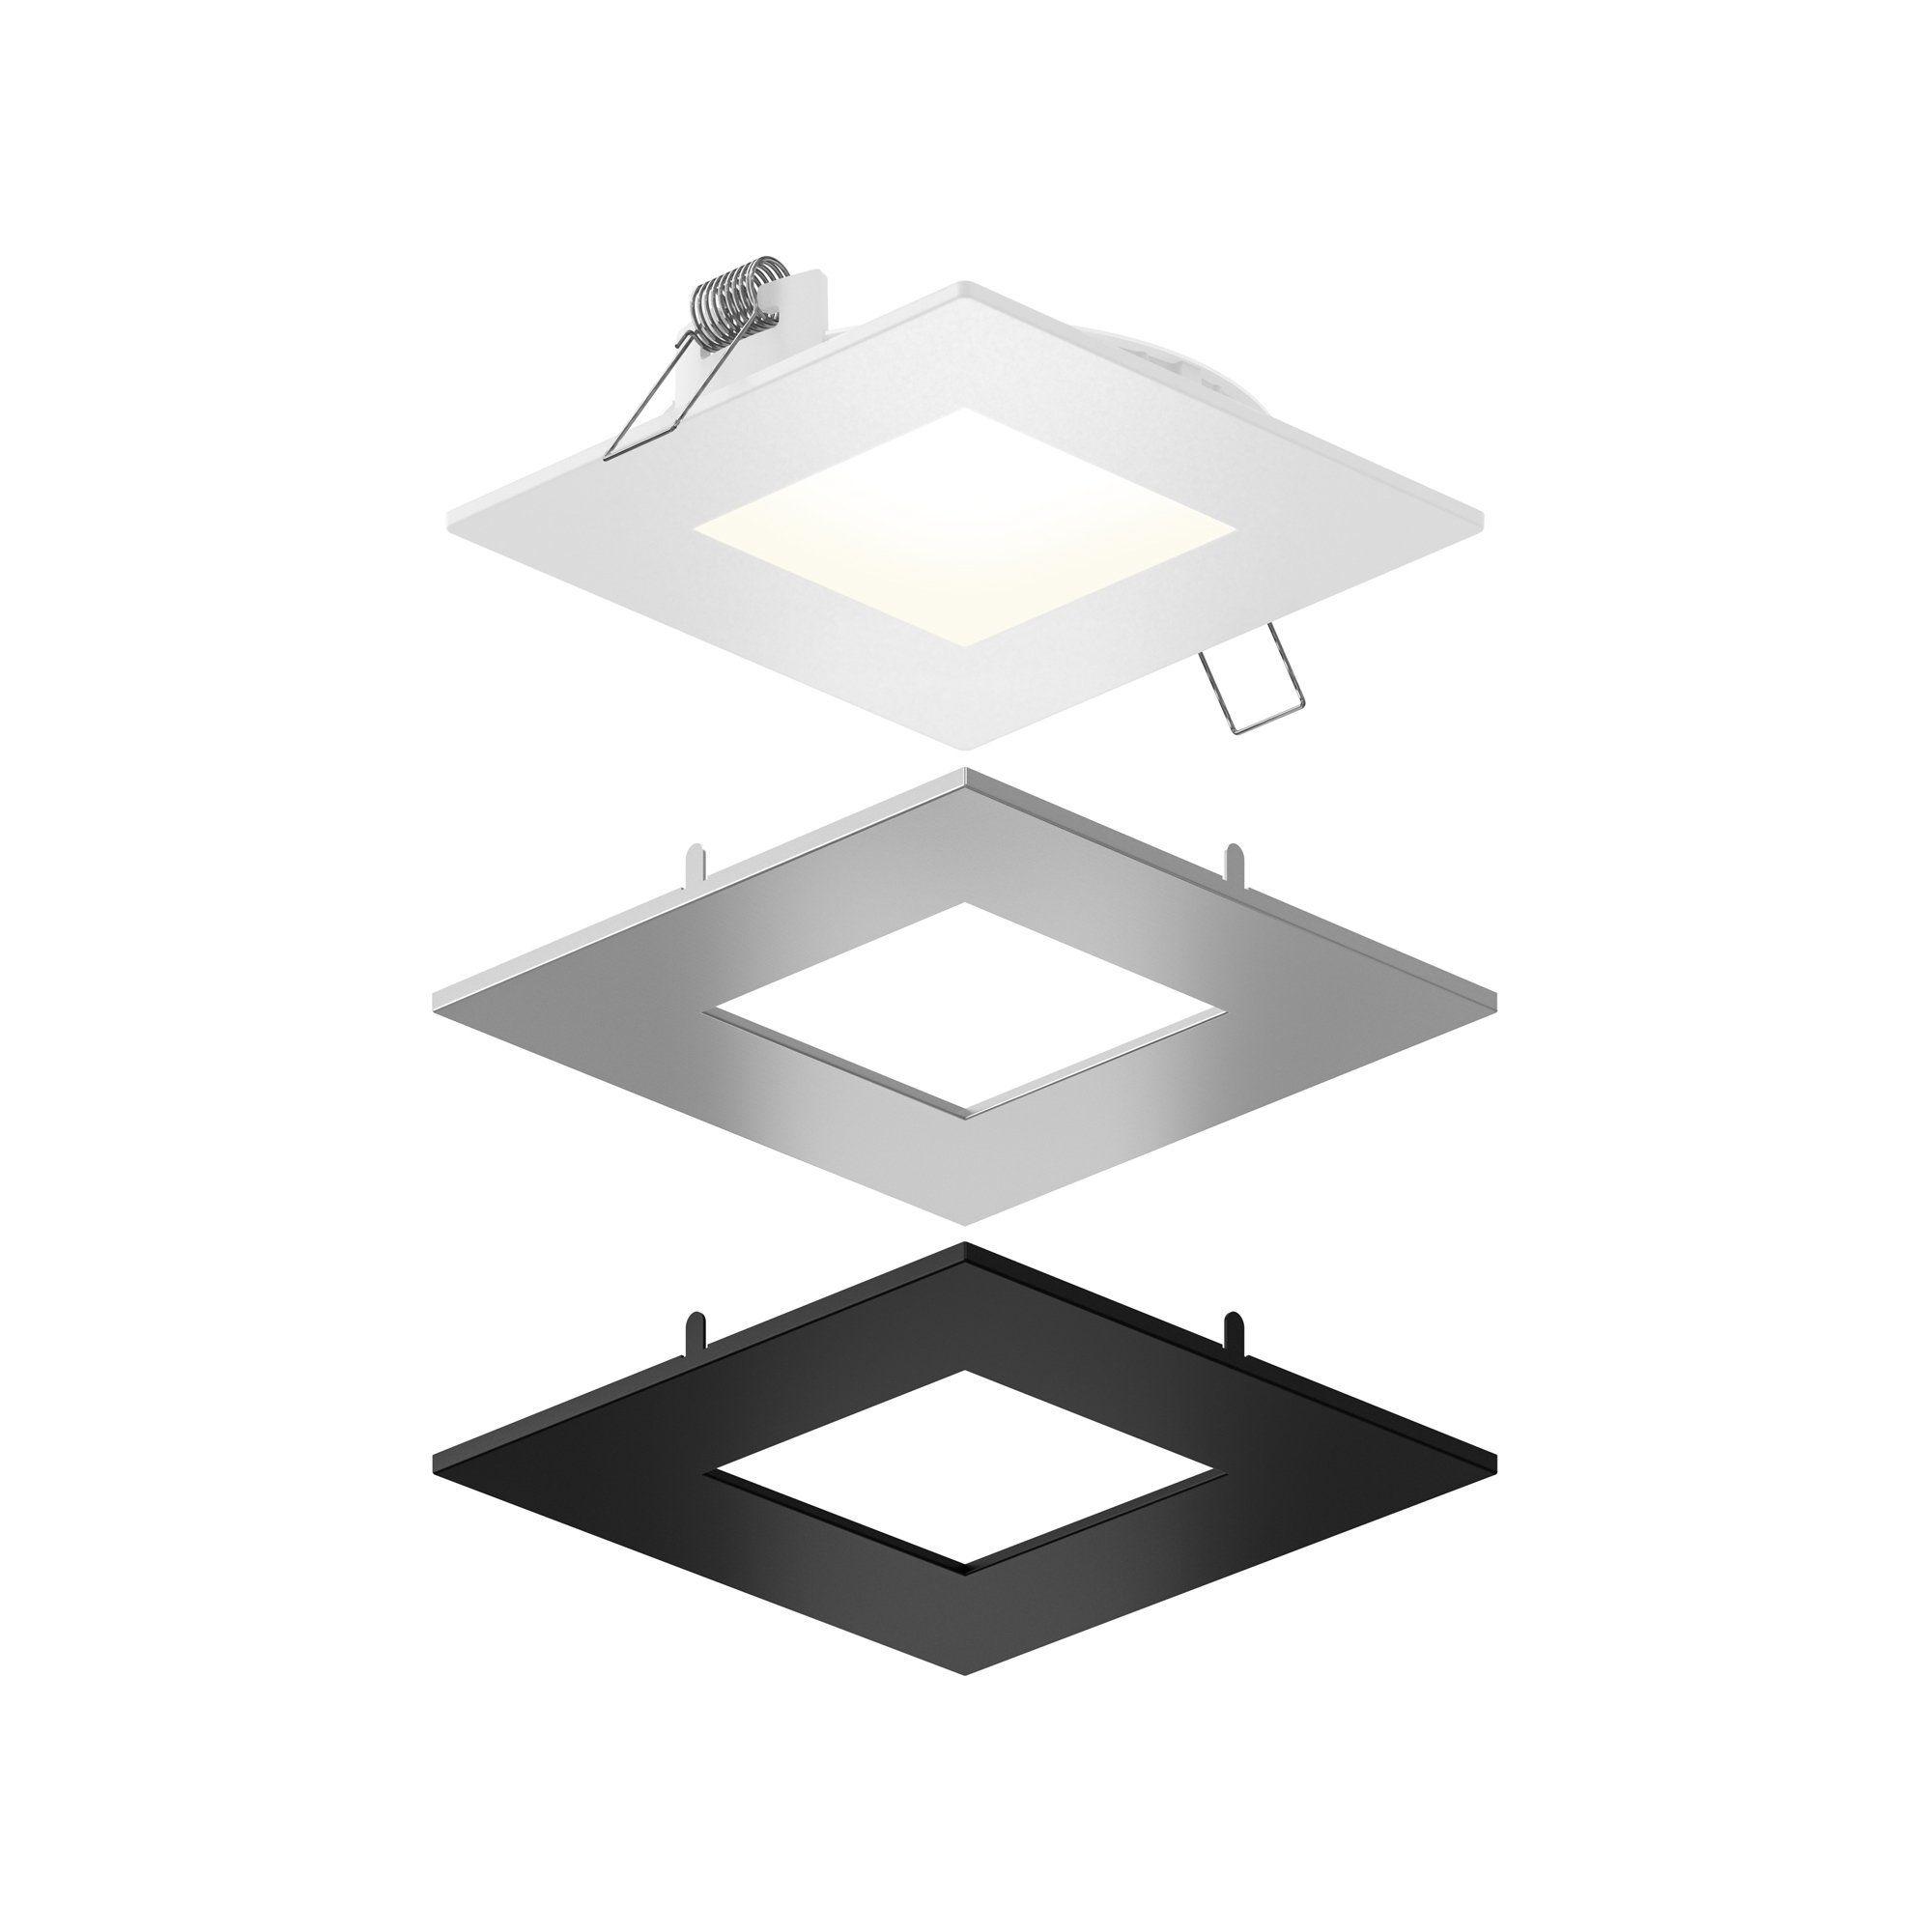 4 Square Led Panel Light 11w 750lm Wet Location 3cct 50 000 Hours White Sn Black Al Led Panel Light Recessed Lighting Kits Recessed Lighting